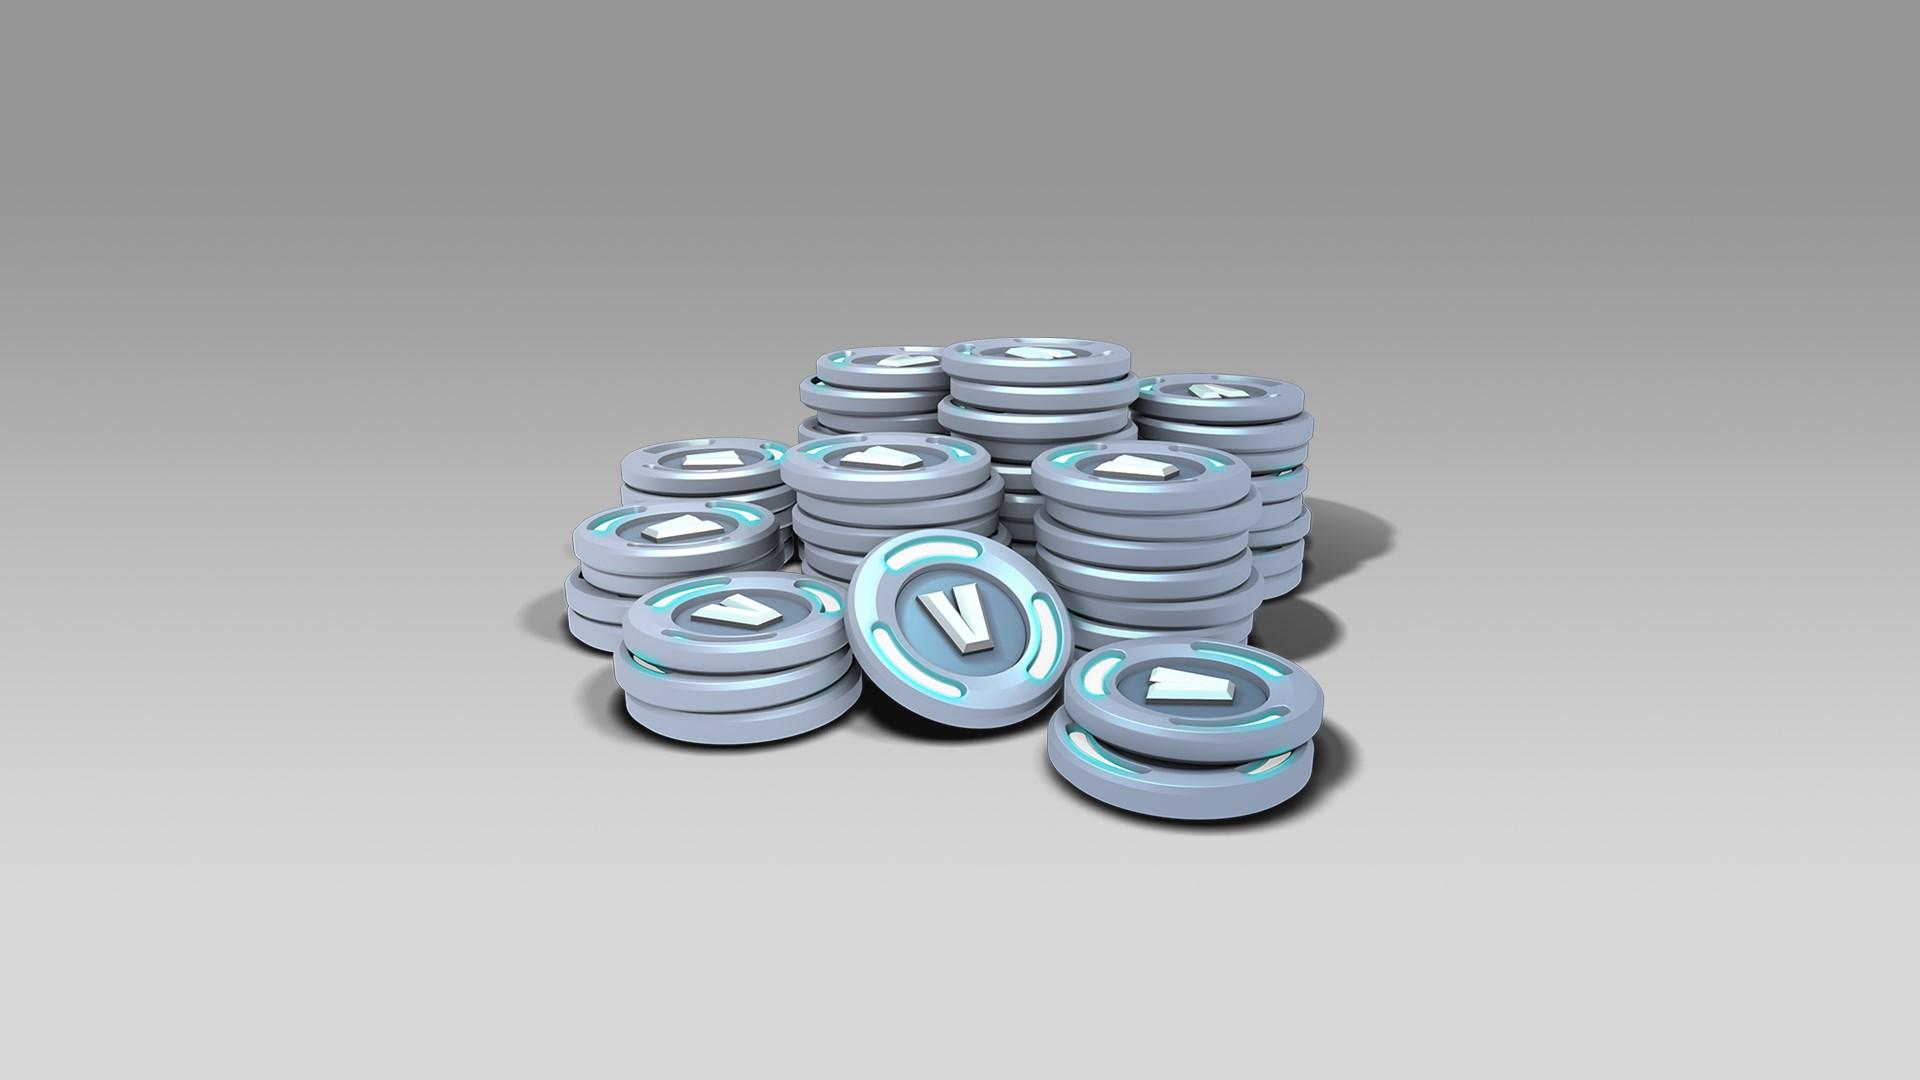 Buy Fortnite   4000 1000 Bonus V Bucks   Microsoft Store 1920x1080